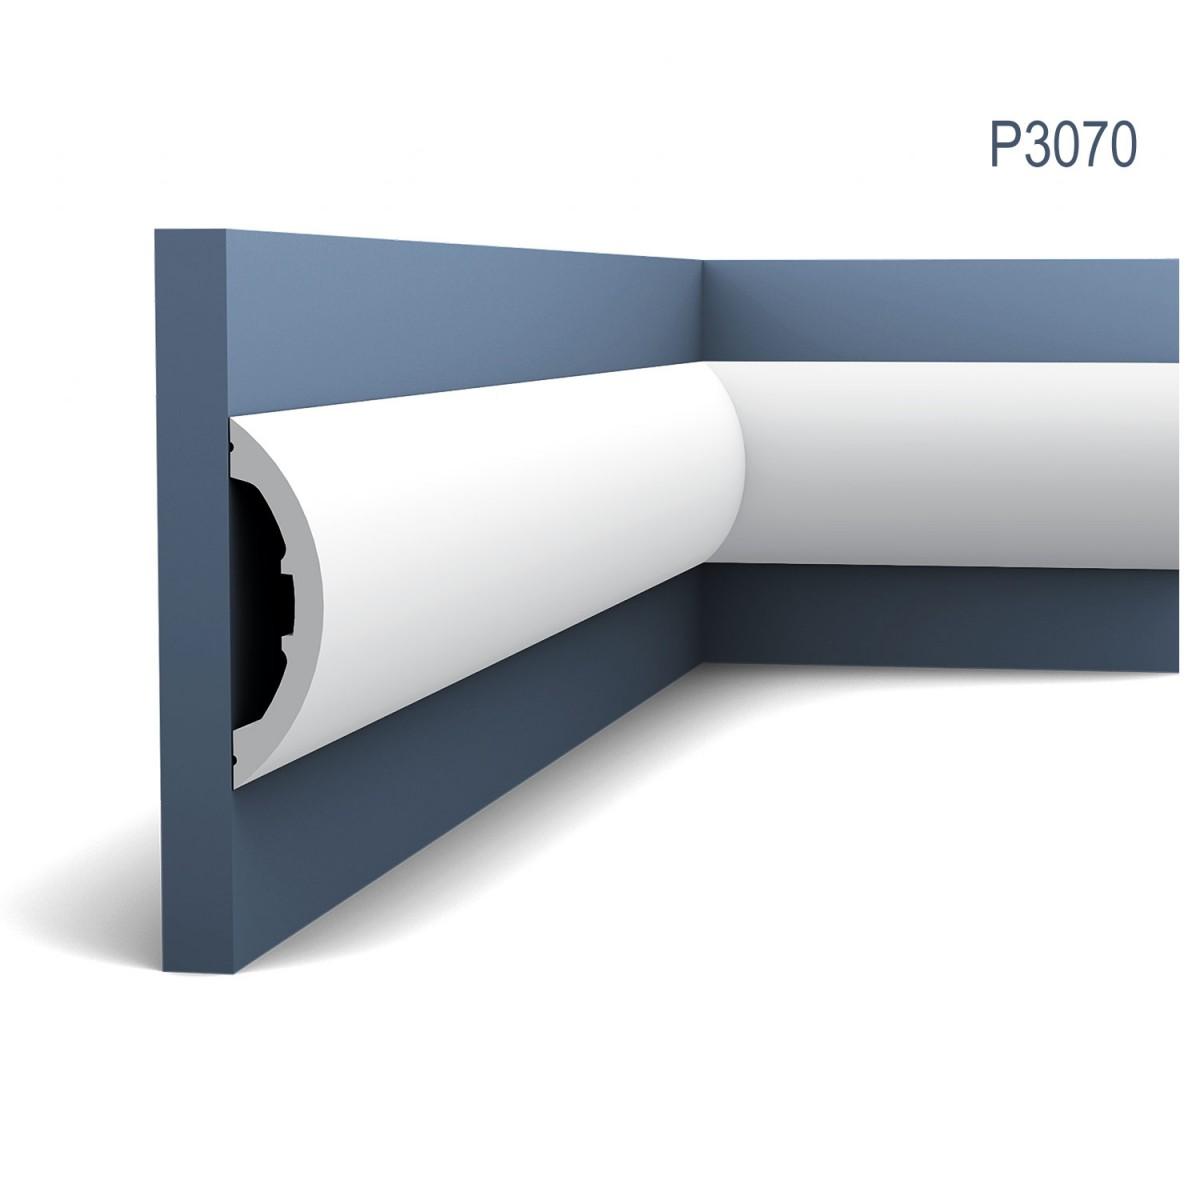 Brau Ulf Moritz P3070, Dimensiuni: 200 X 12.5 X 3.2 cm, Orac Decor